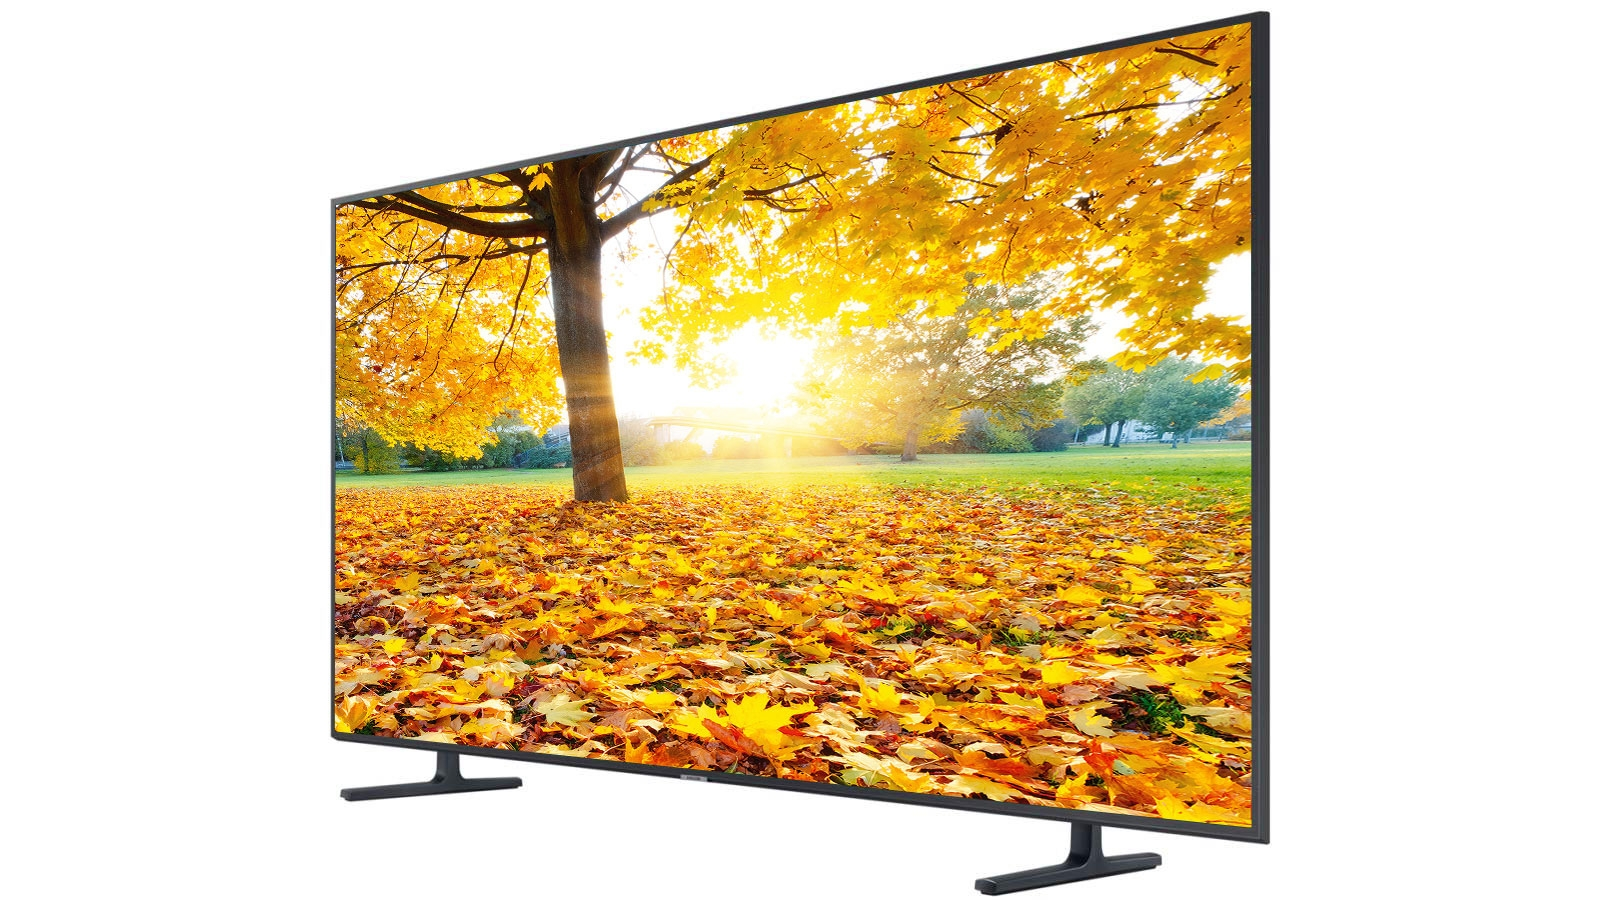 Samsung 65-inch RU8000 4K UHD LED LCD Smart TV